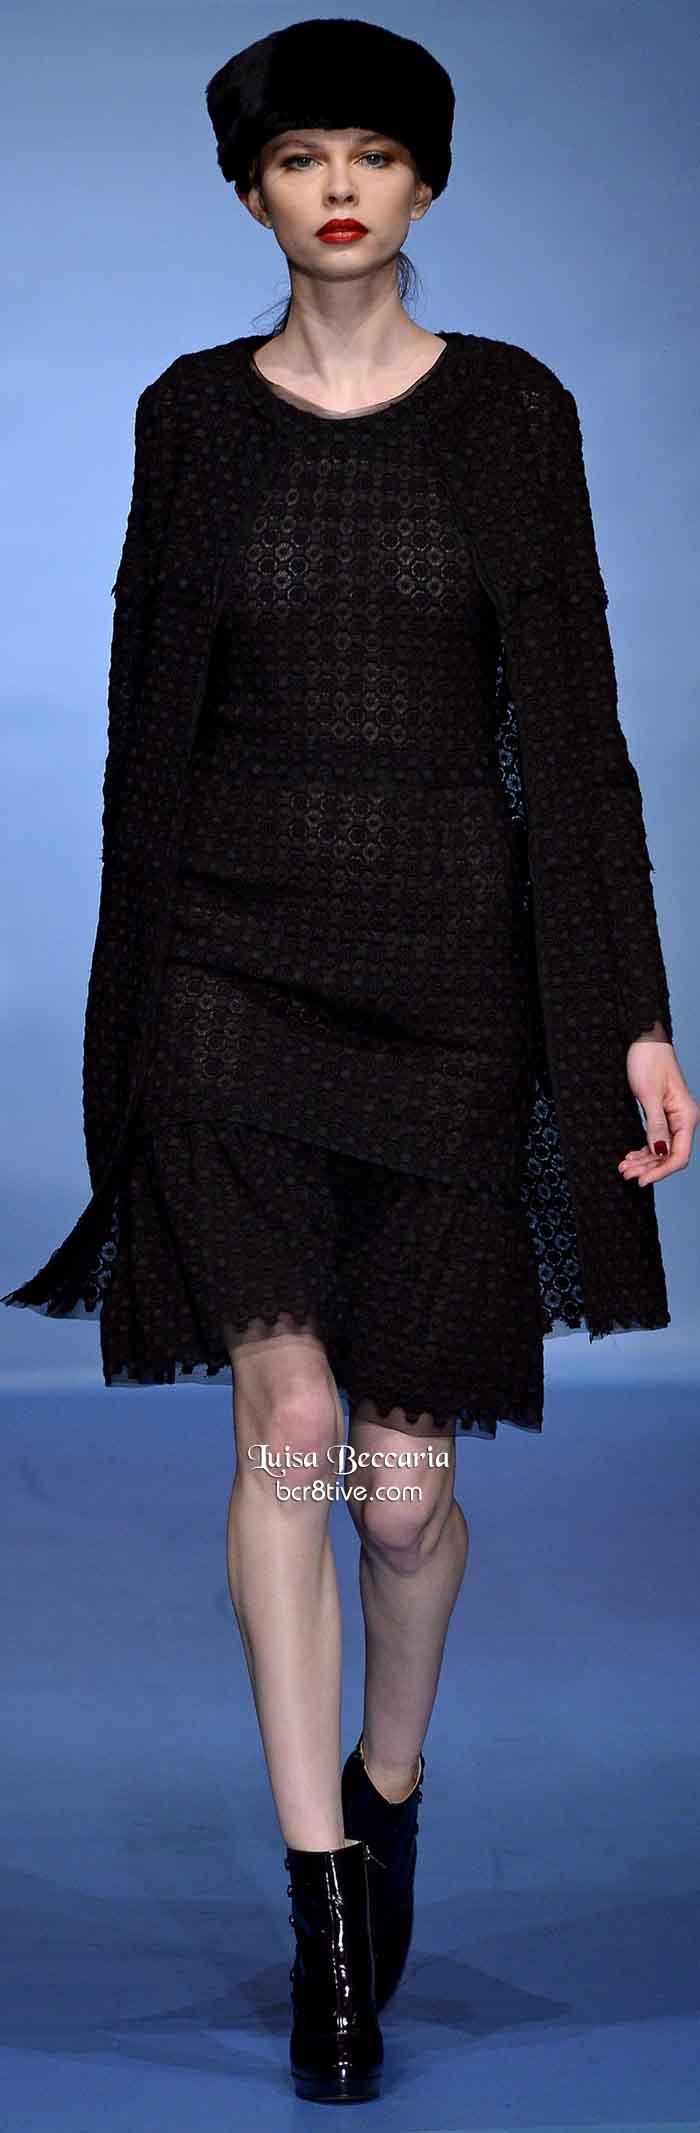 Luisa Beccaria Winter 2013-14